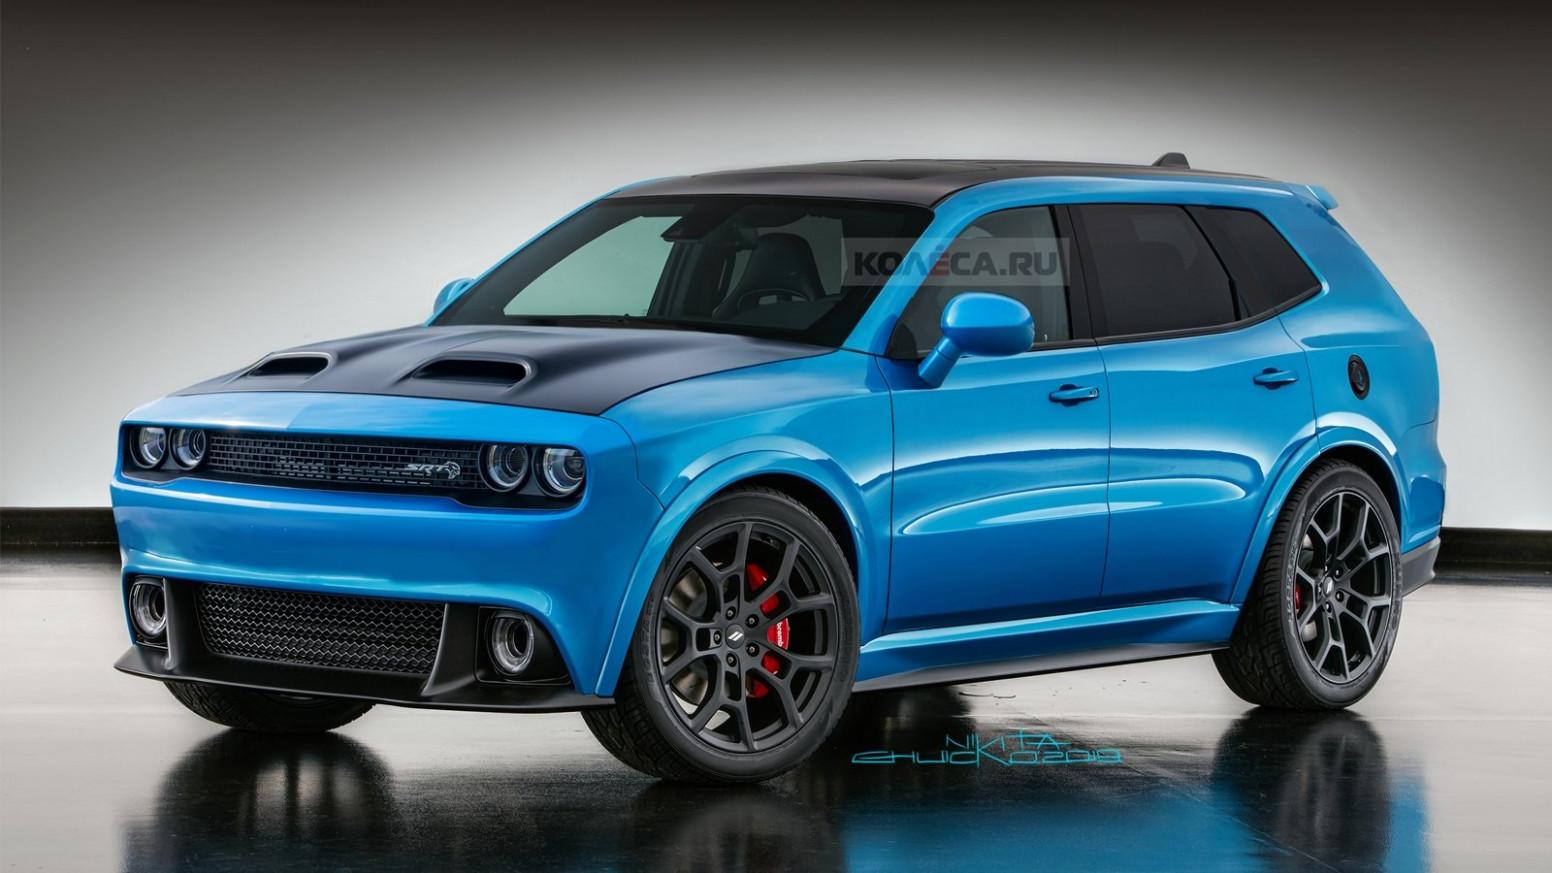 New Concept Dodge Challenger Concept 2022